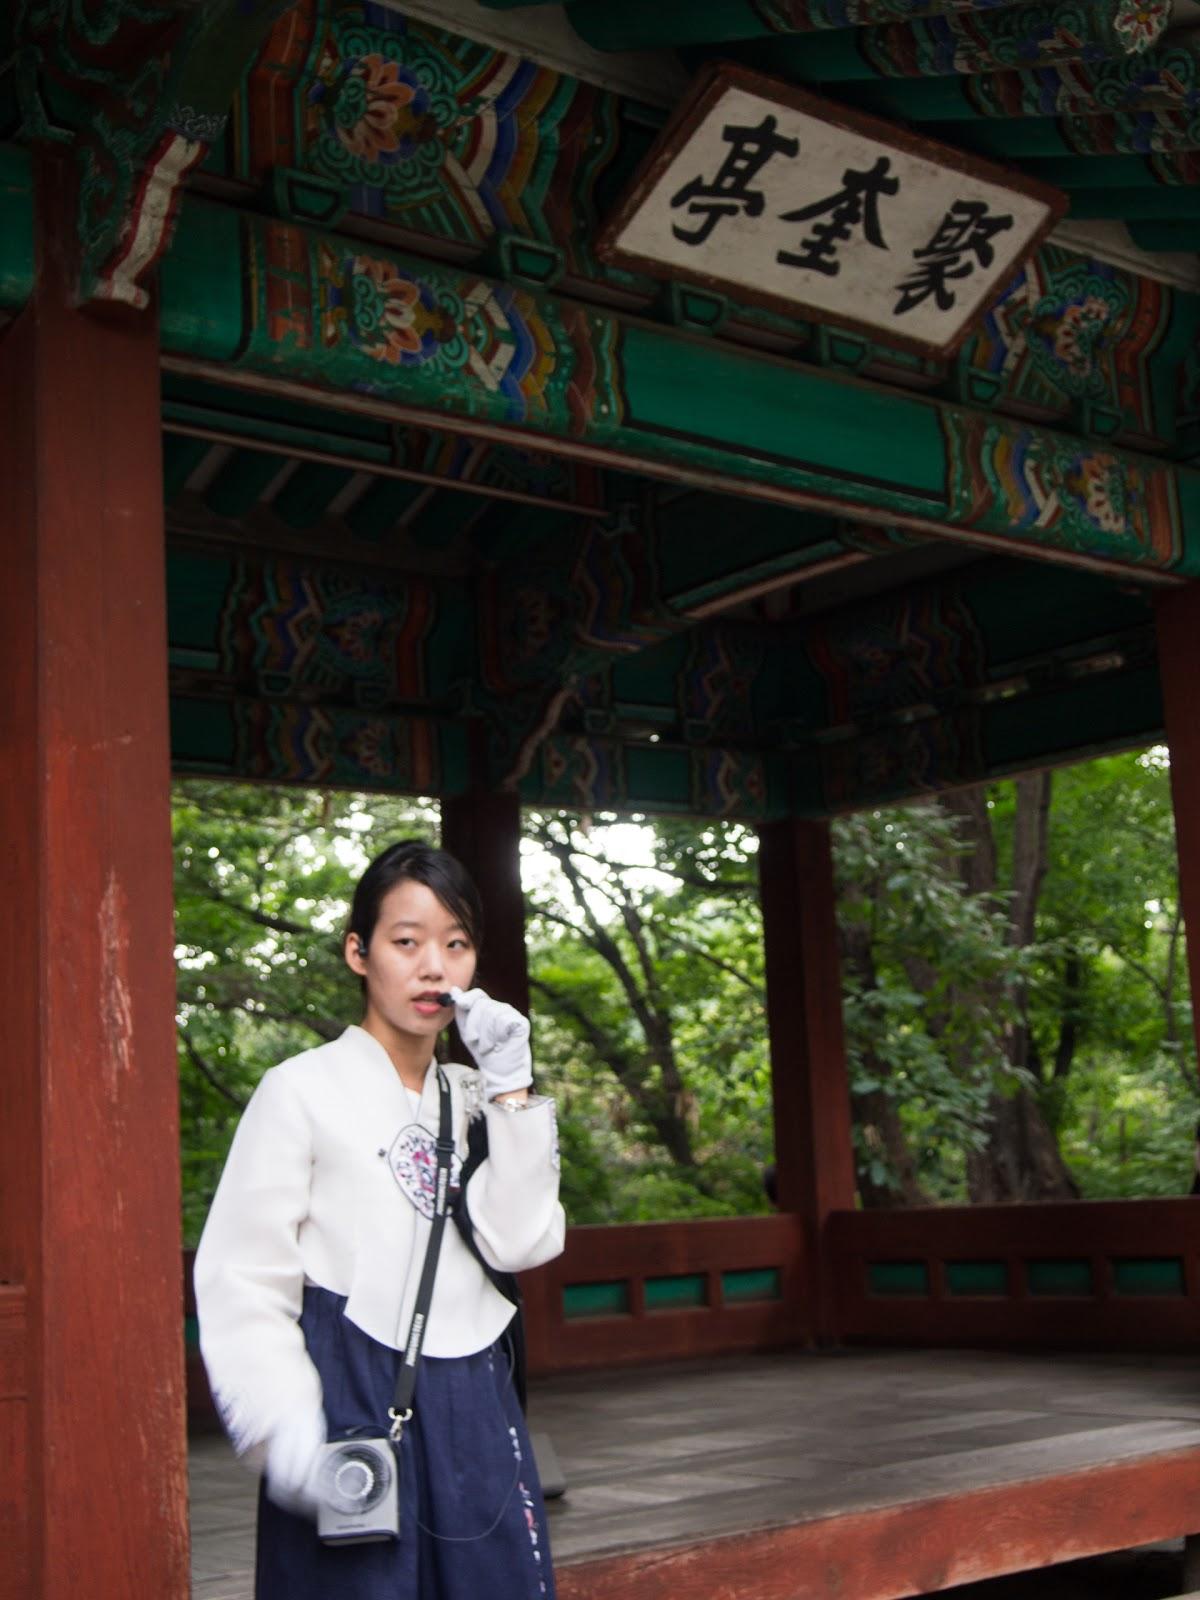 Changdeokgung Secret Garden, Changdeokgung biwon